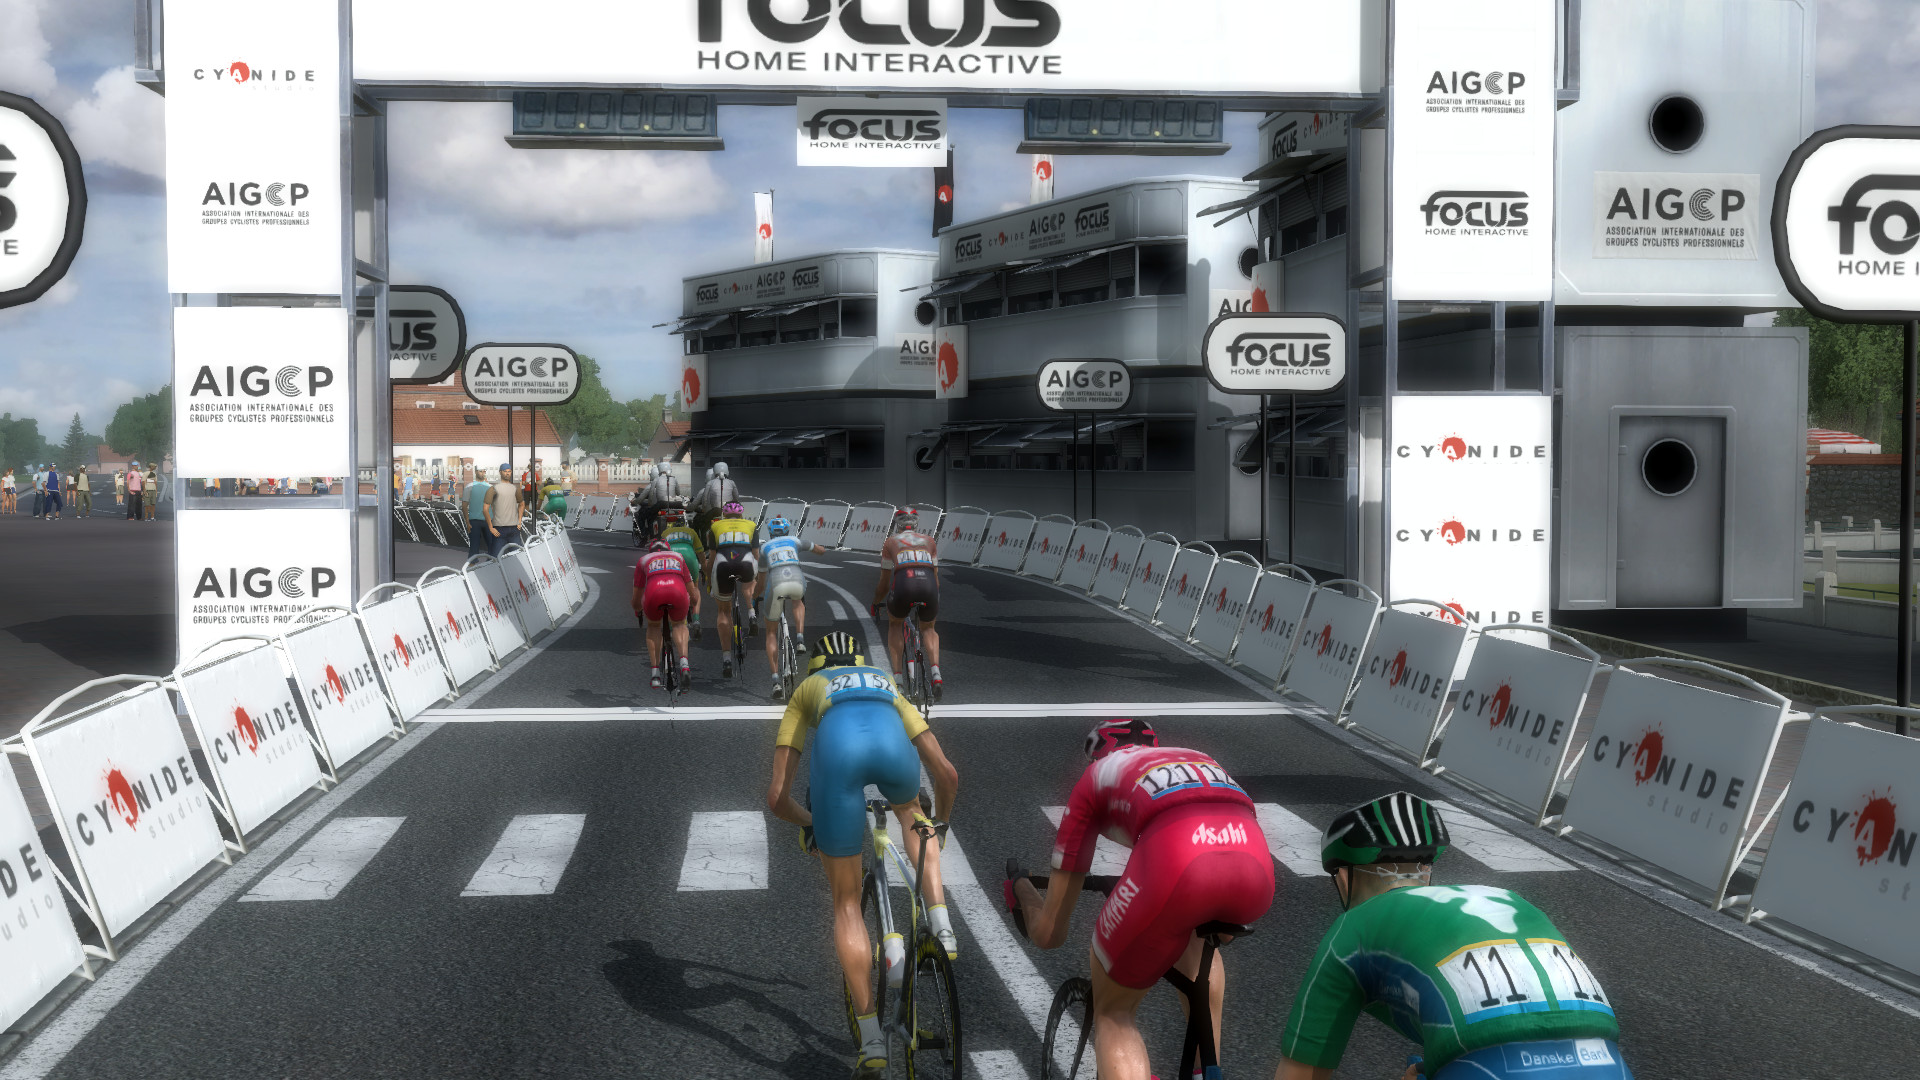 pcmdaily.com/images/mg/2019/Races/C1/Malopolski/35.jpg